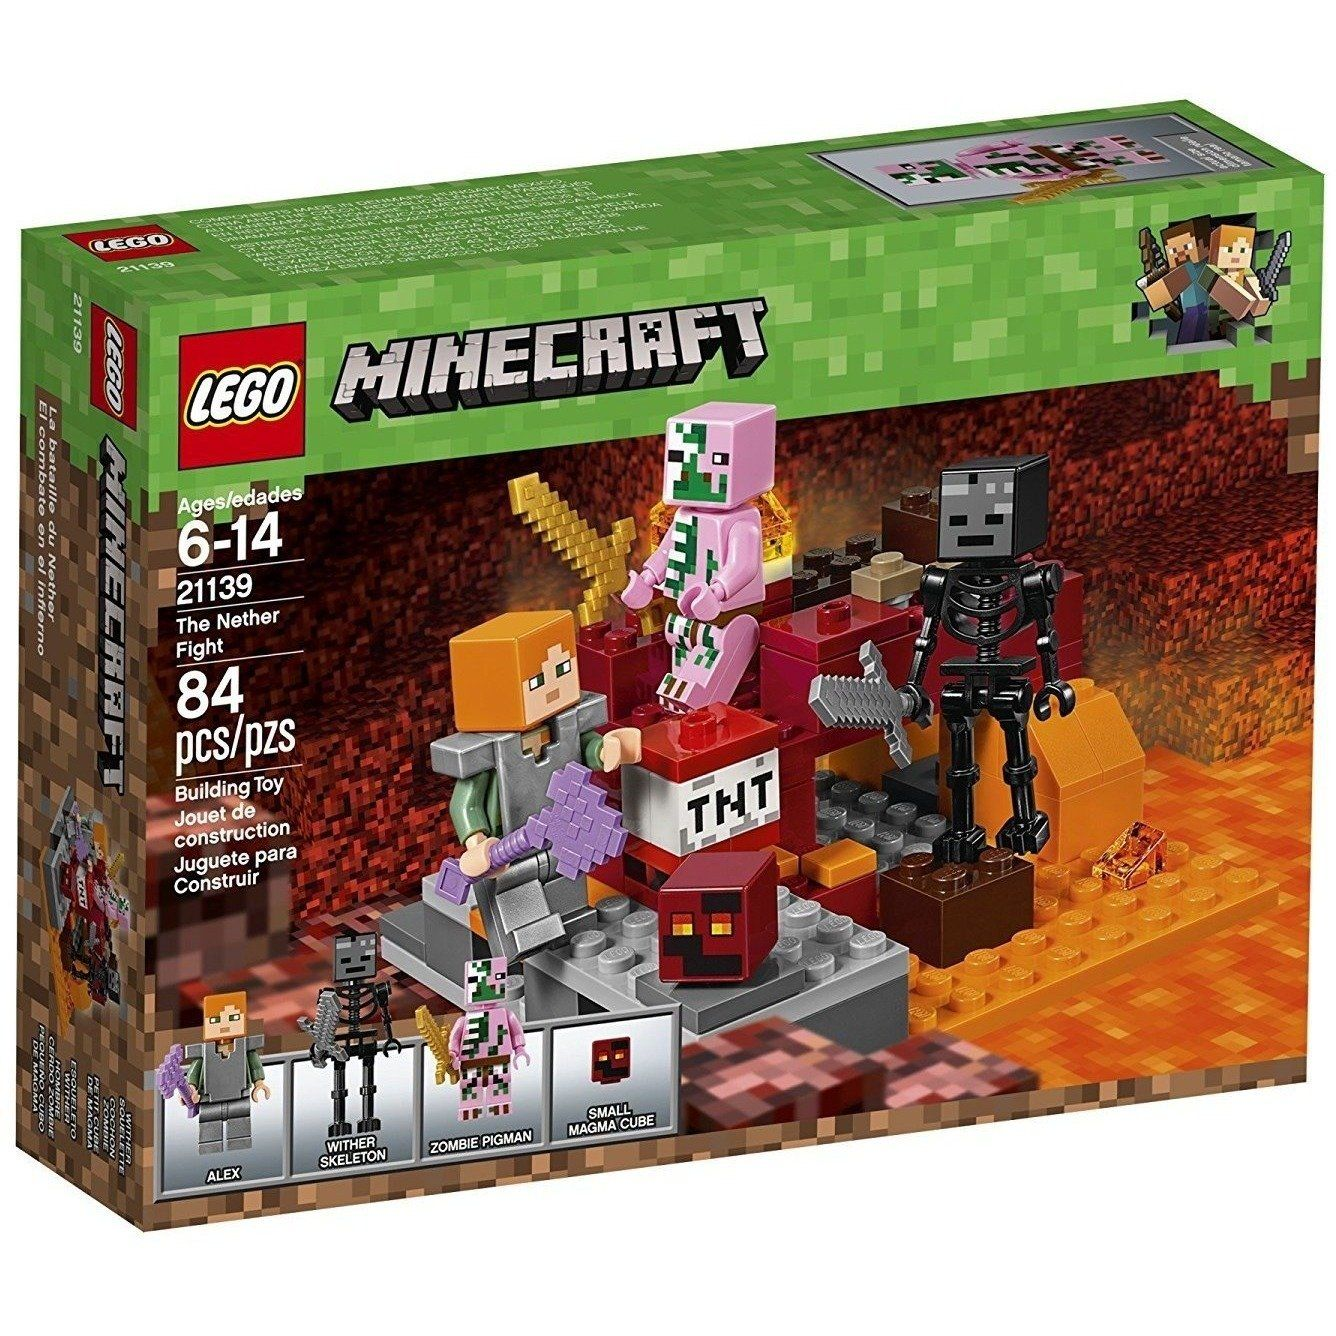 LEGO 21139 Minecraft The Nether Fight Liam's stuff